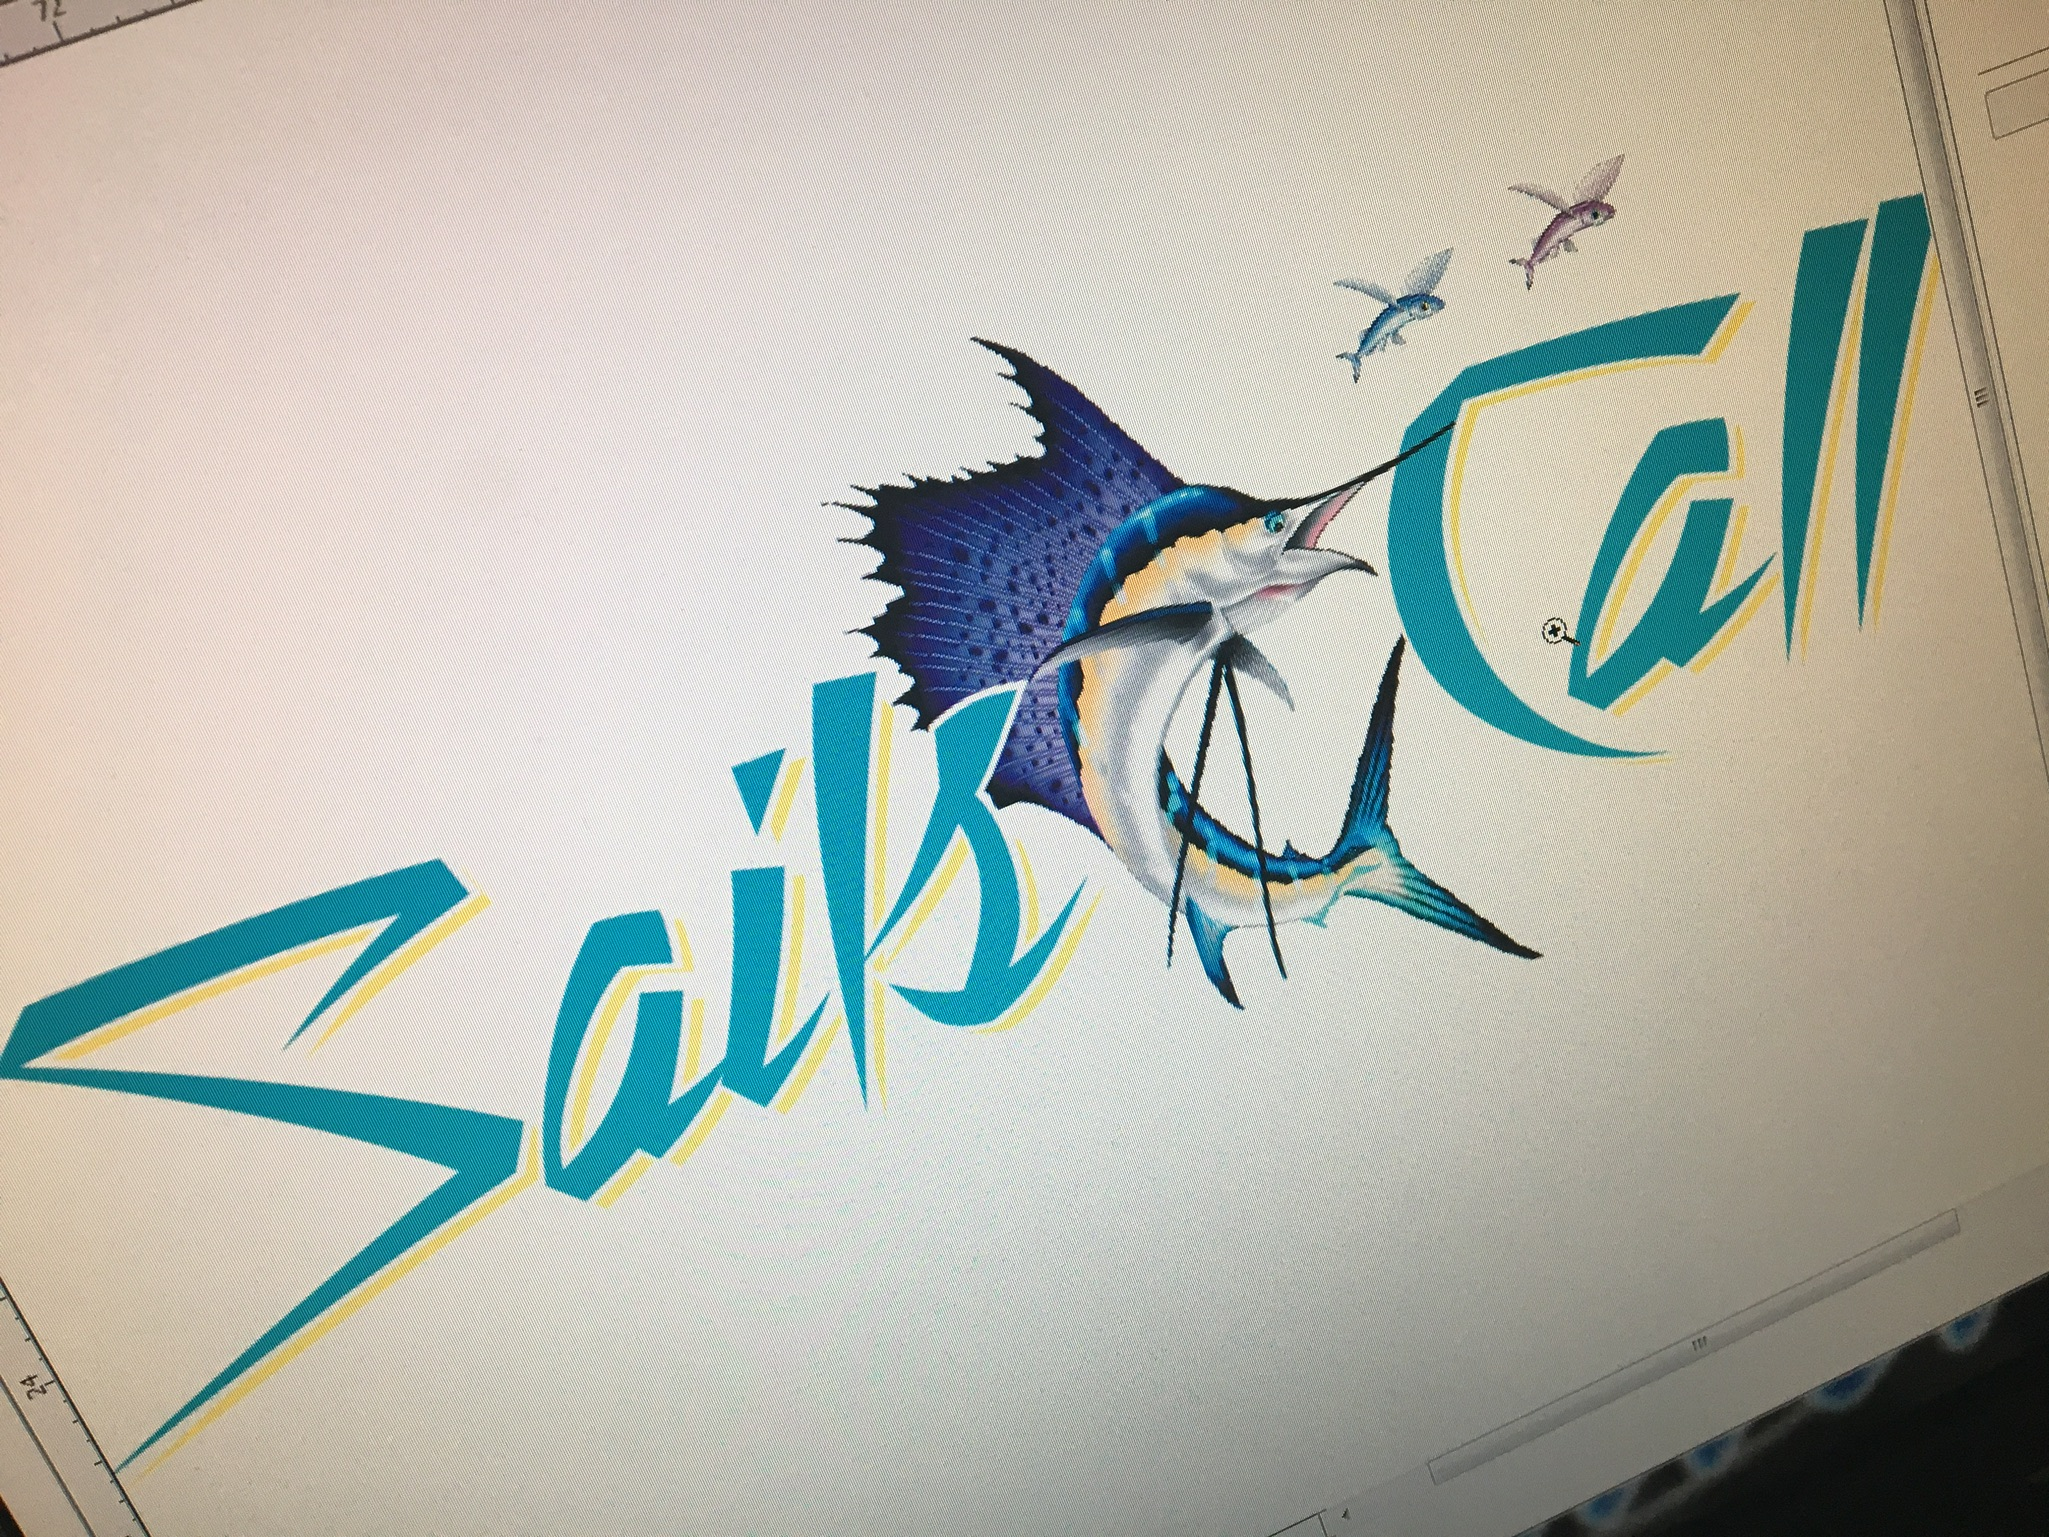 Sails Call